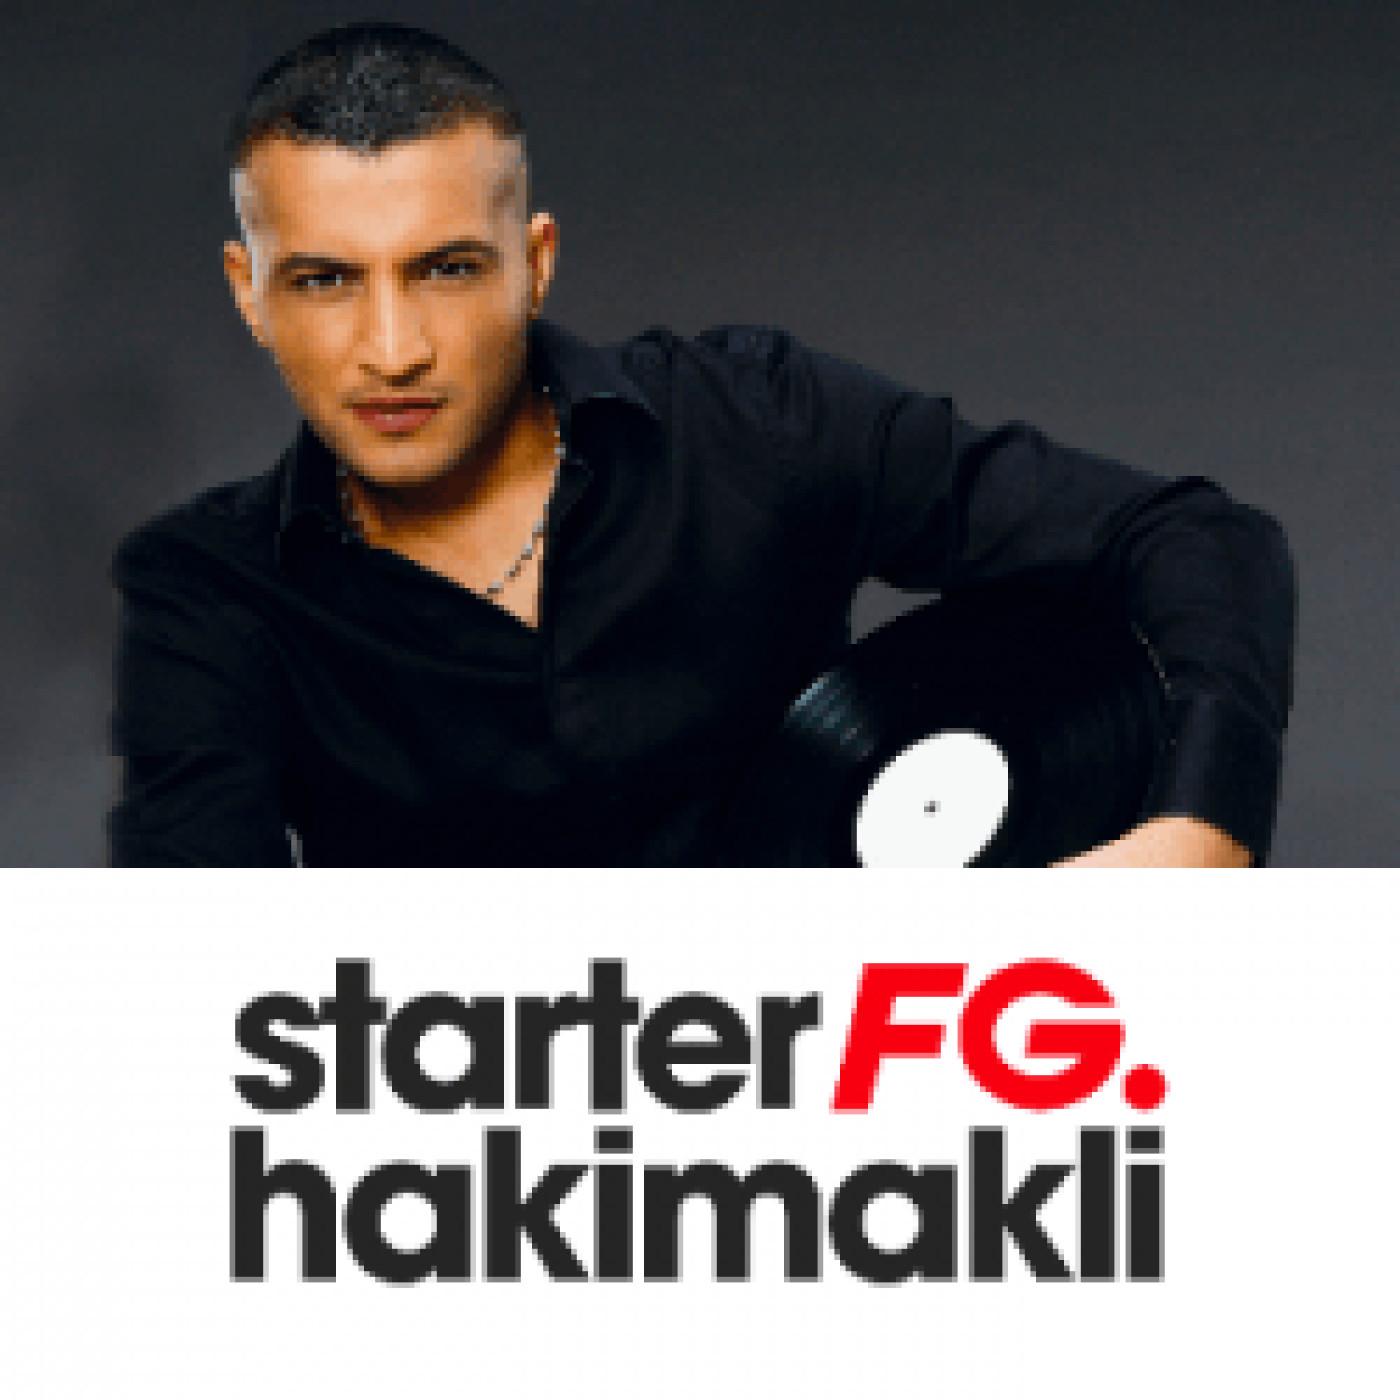 STARTER FG BY HAKIMAKLI MARDI 03 NOVEMBRE 2020